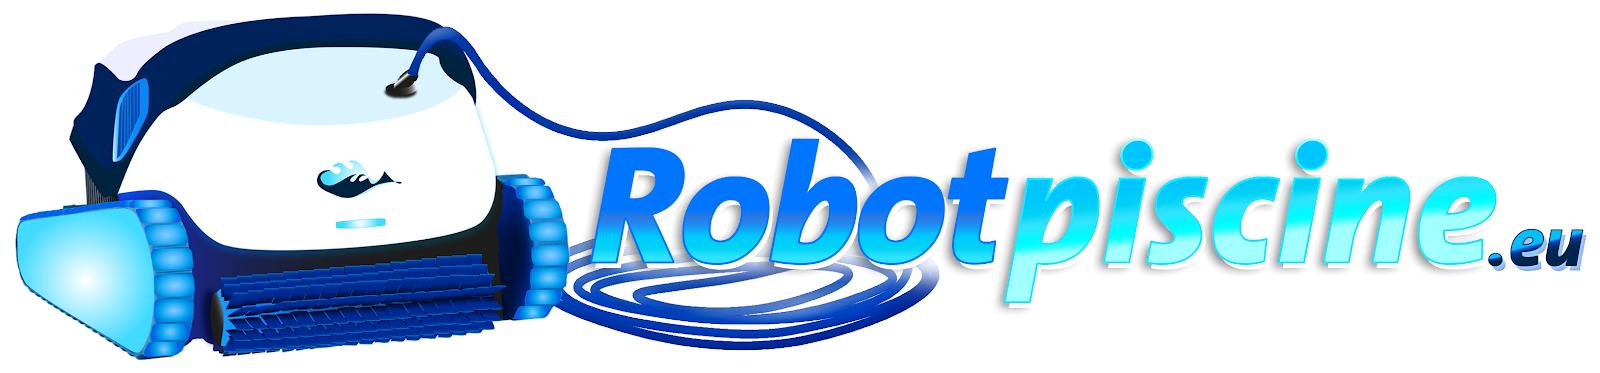 Meilleur Robot piscine